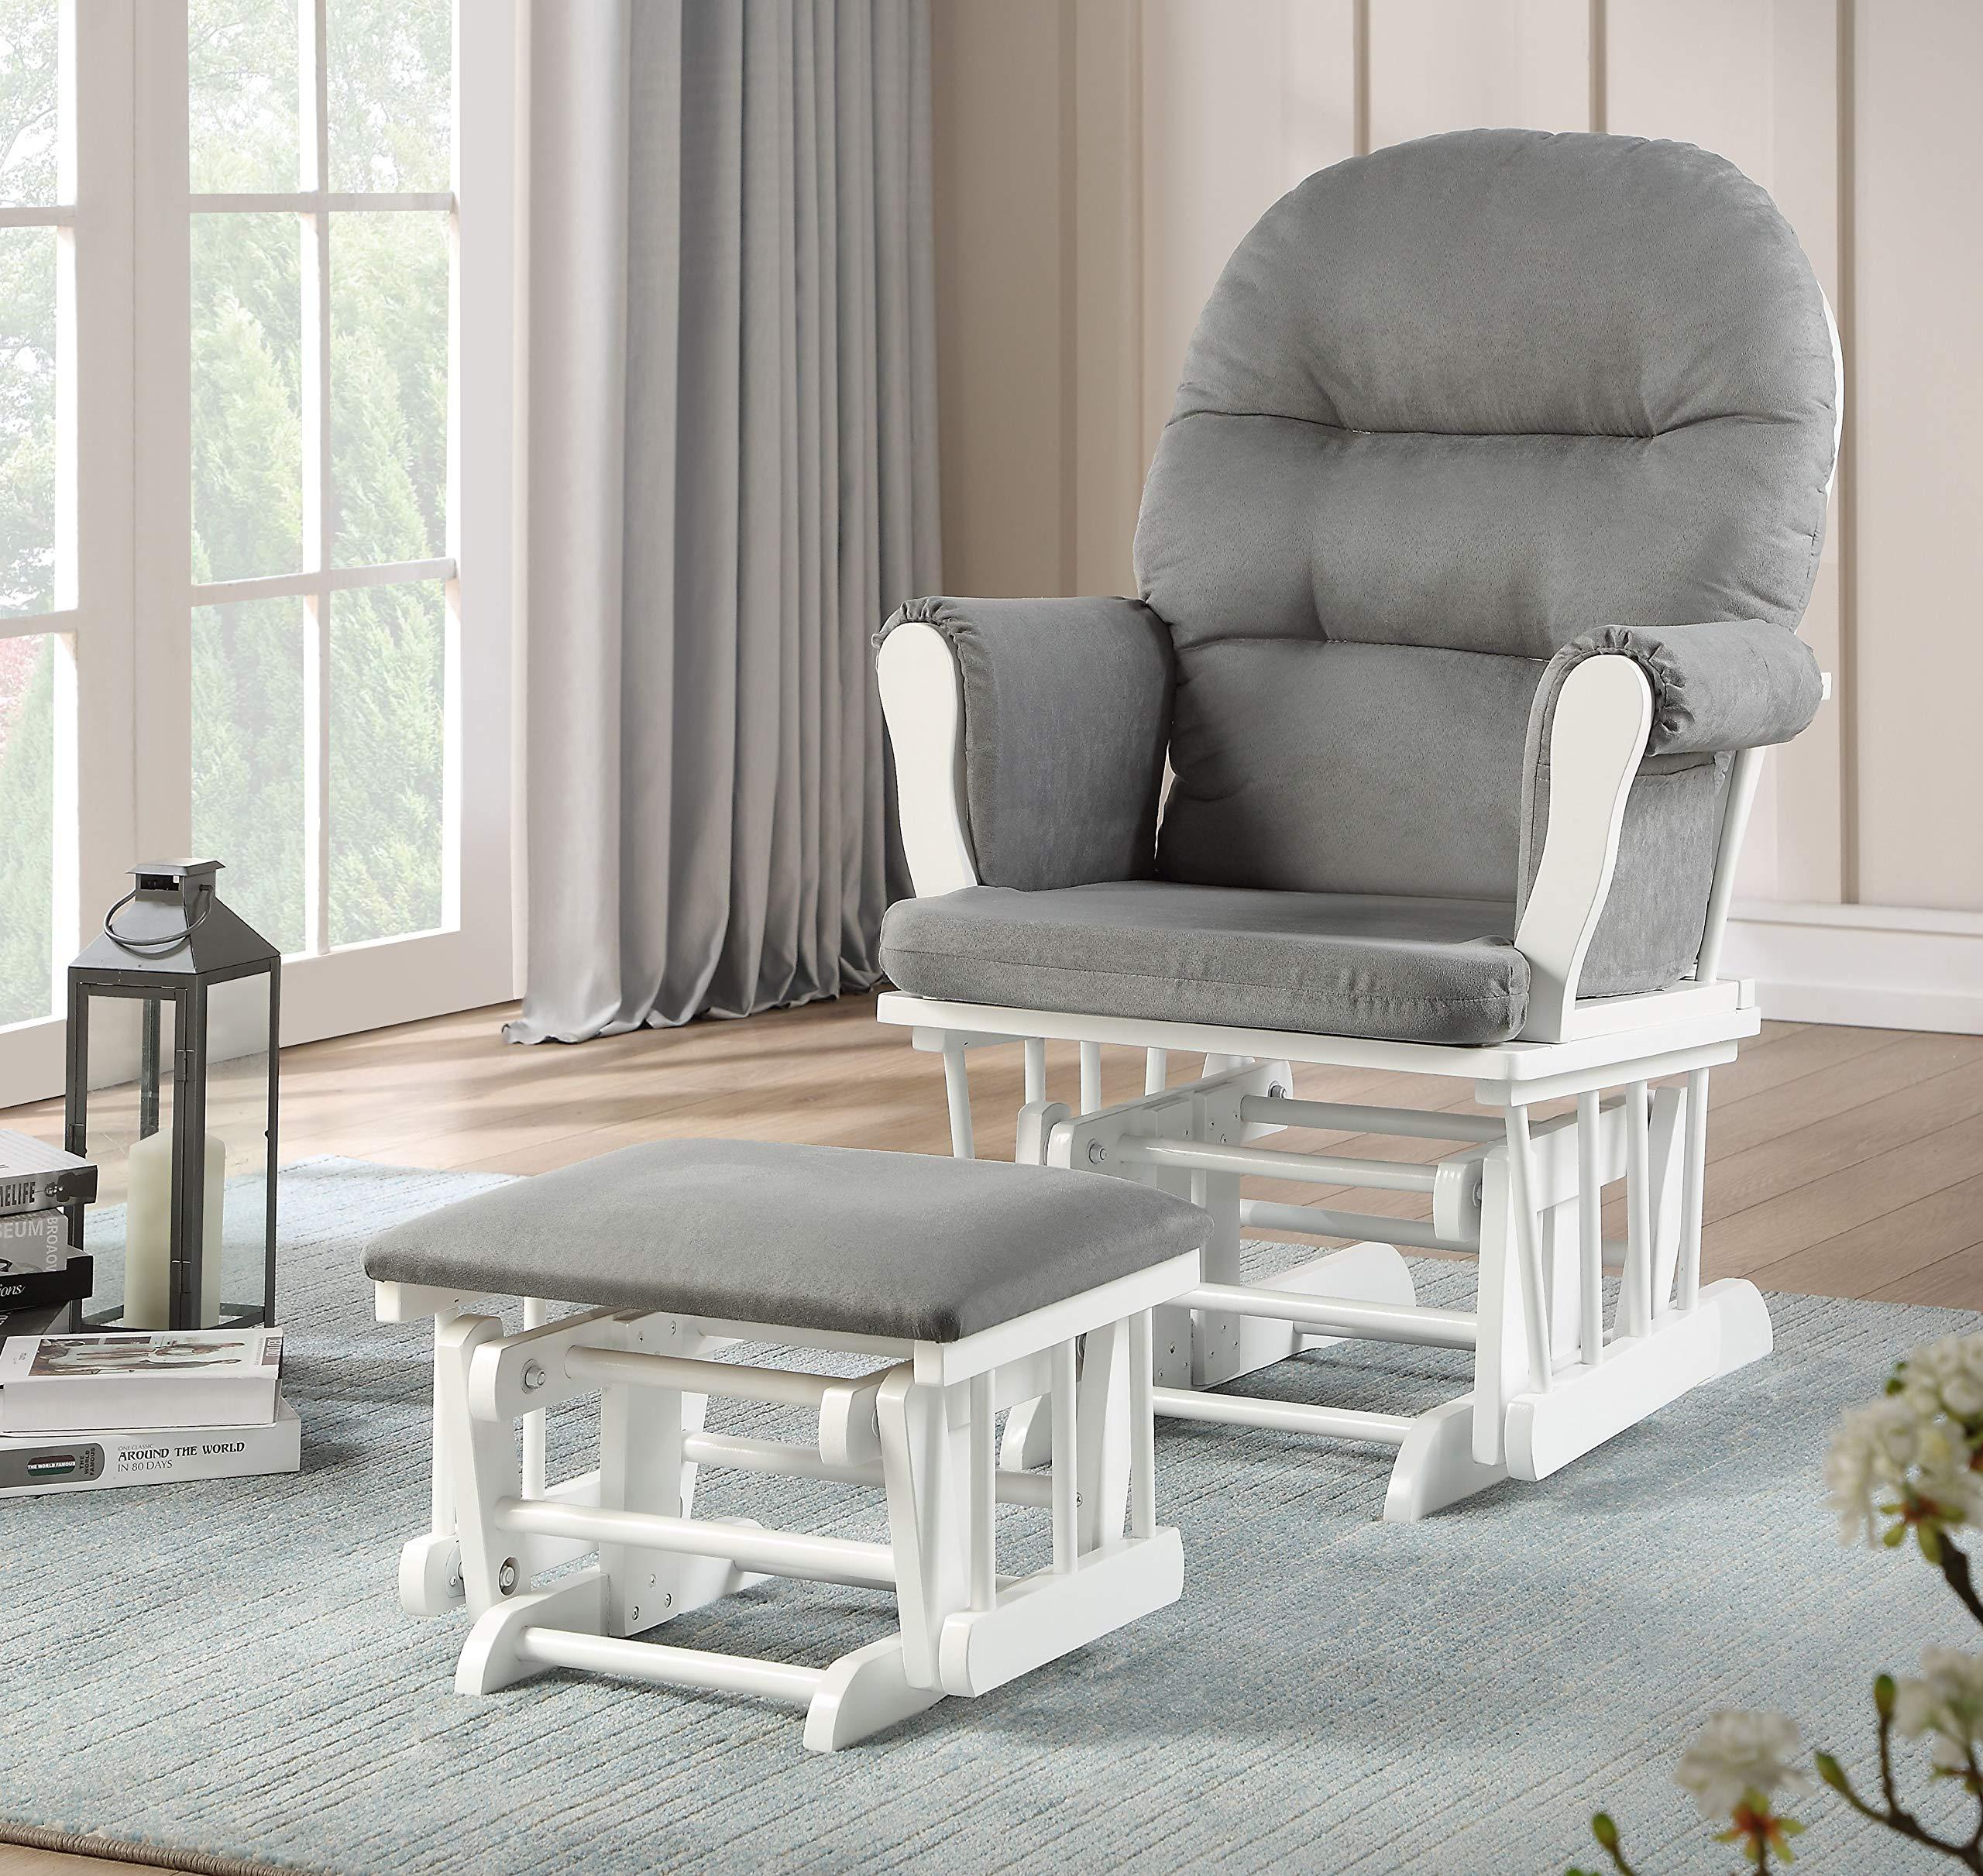 Lennox Furniture Emily Glider Chair & Ottoman Combo, White/Grey, White by Lennox Furniture